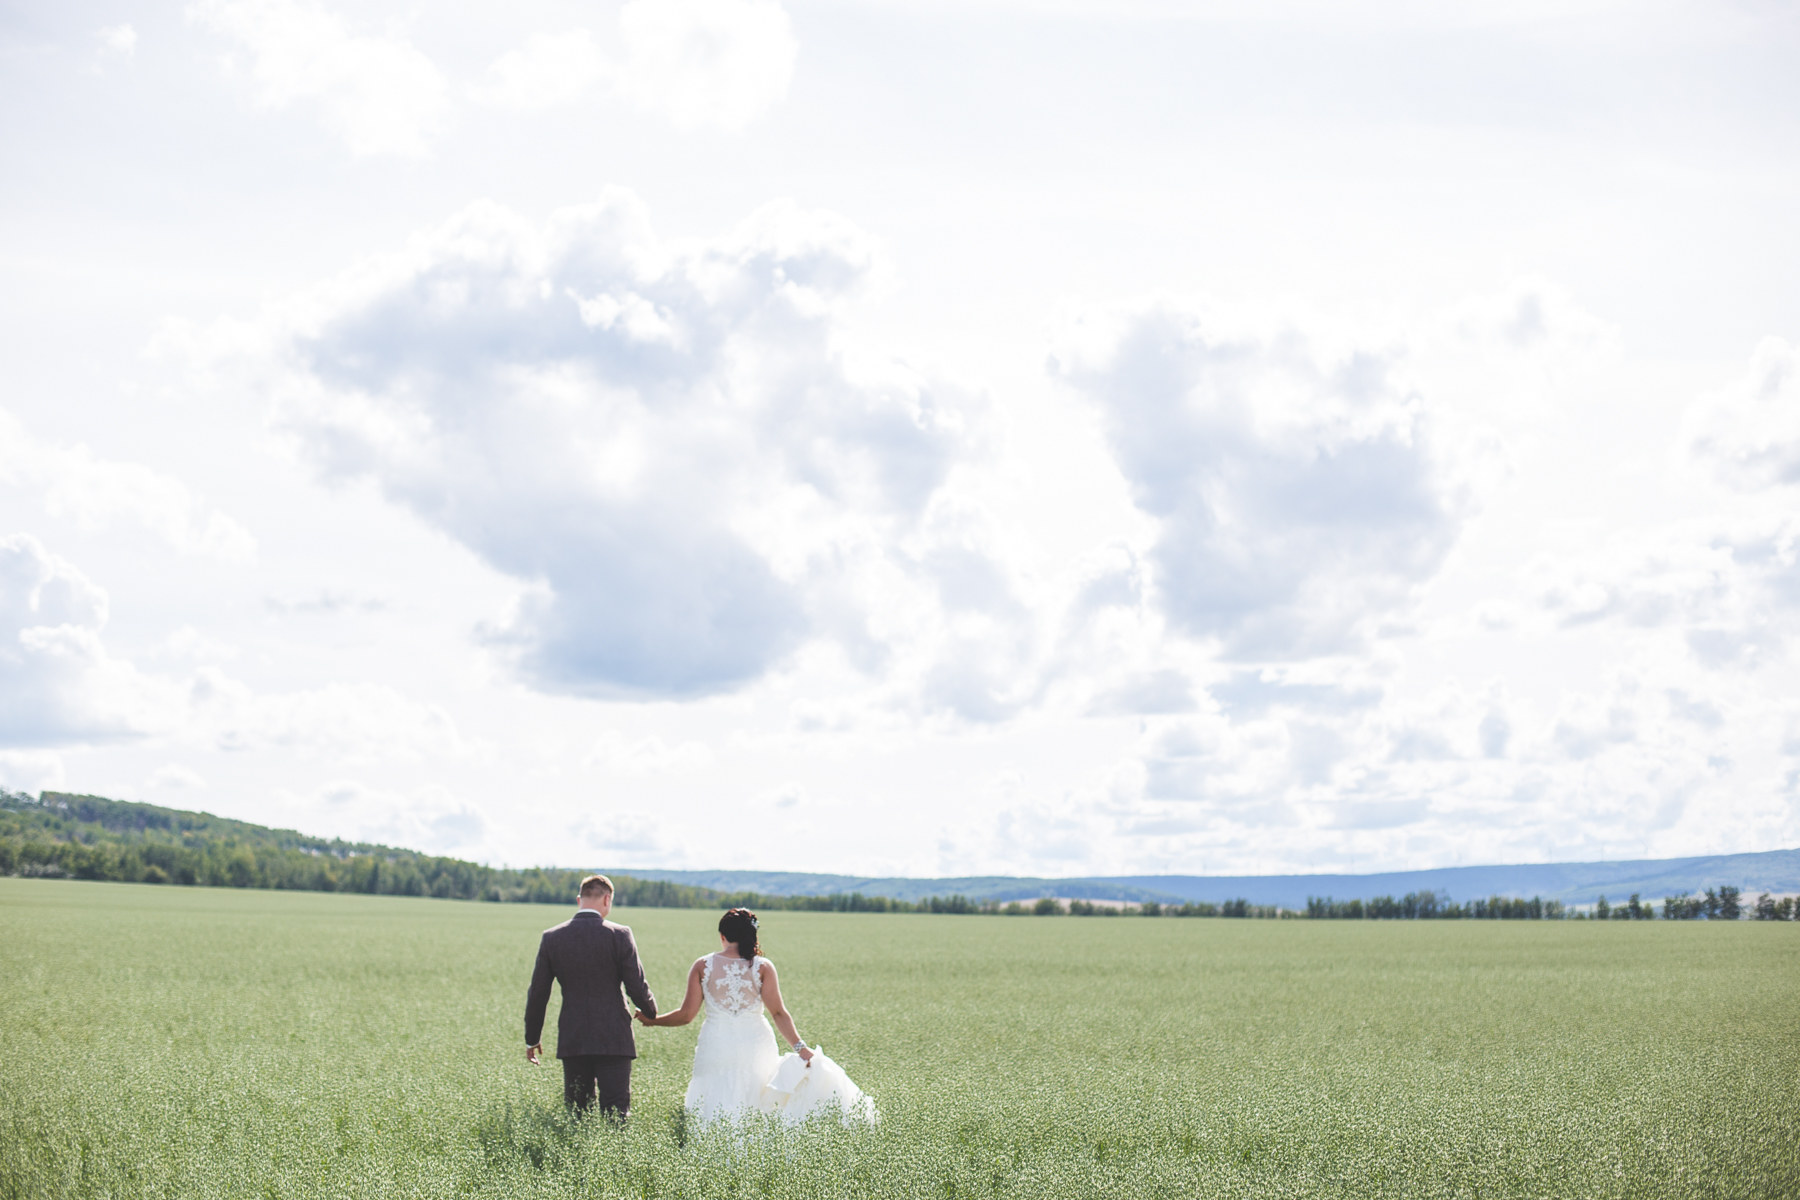 20150808-oglovewedding-1095.jpg